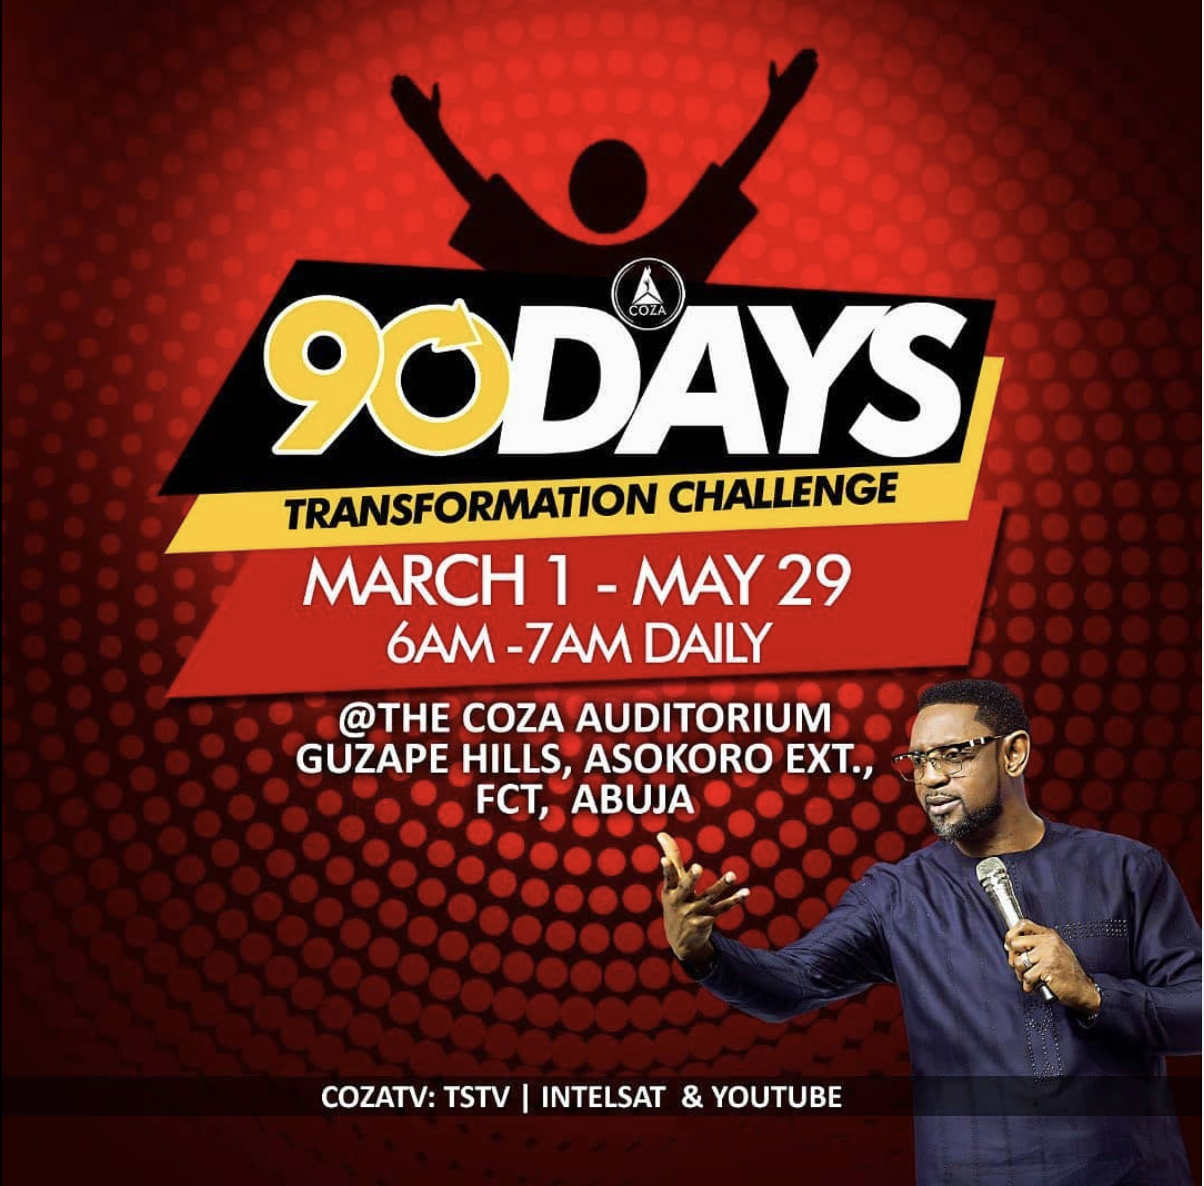 COZA 90 Days Challenge